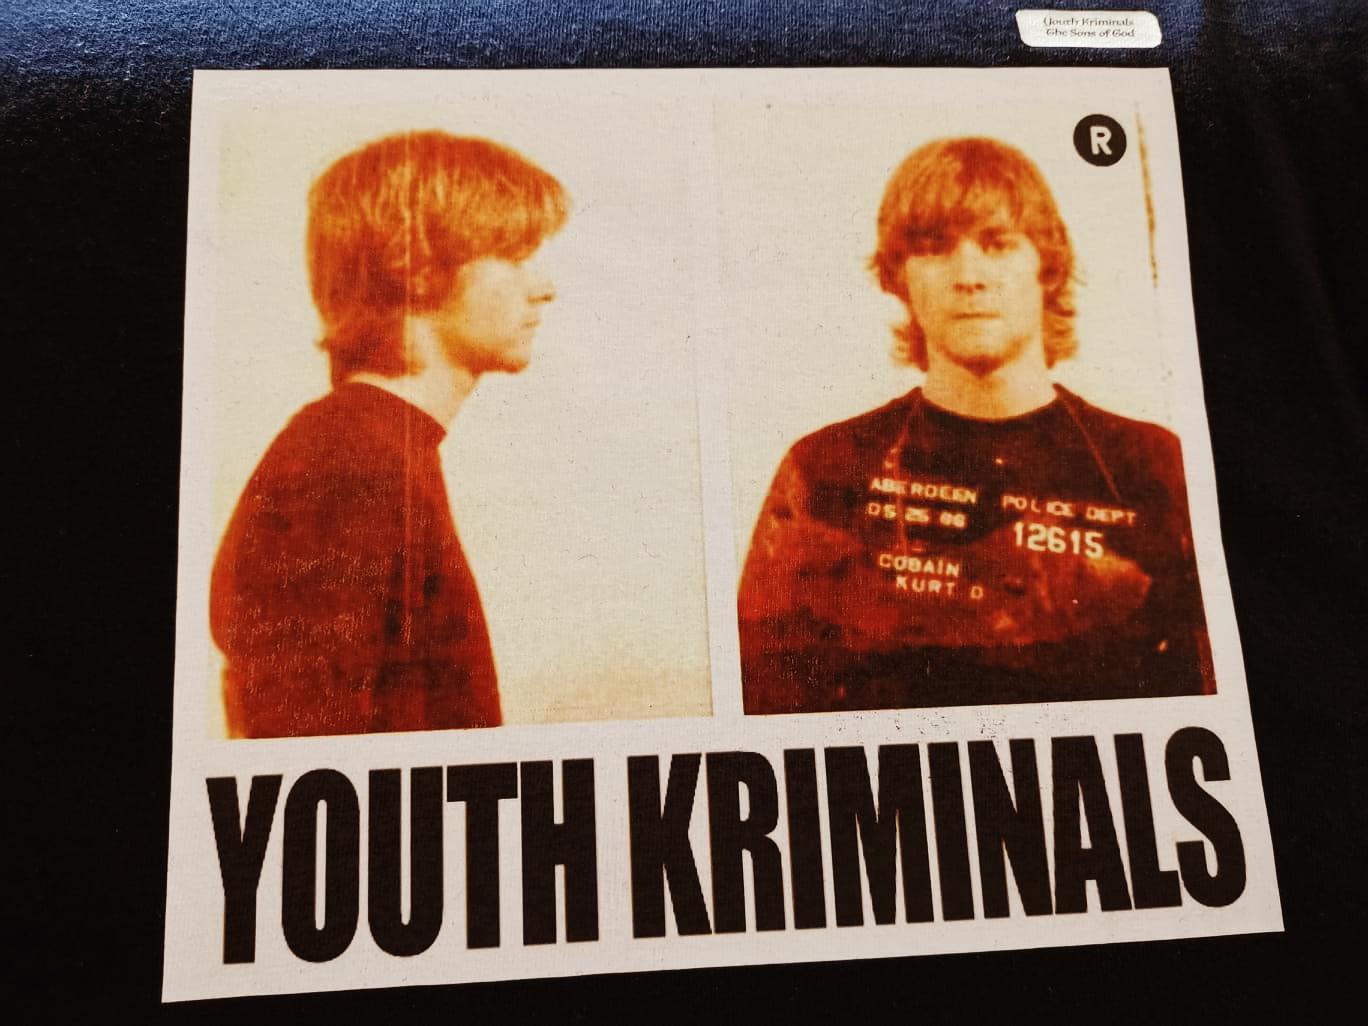 T-SHIRT Youth Kriminals (KURT COBAIN)